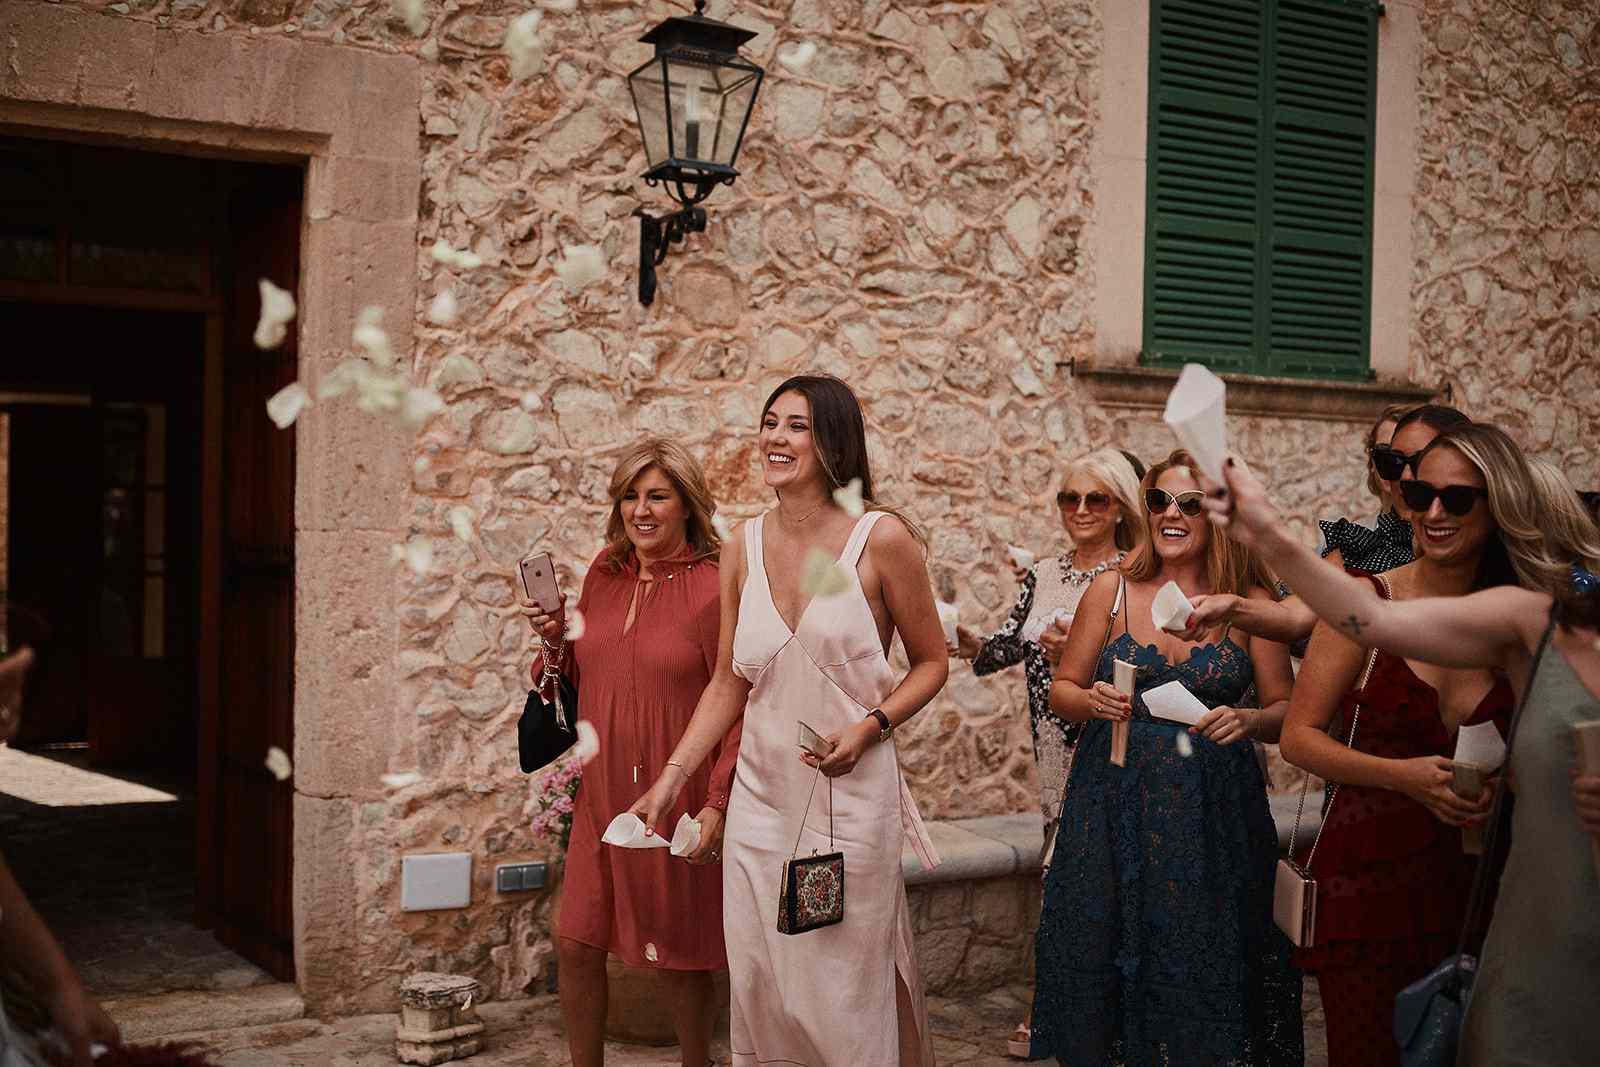 Wedding guests cheering